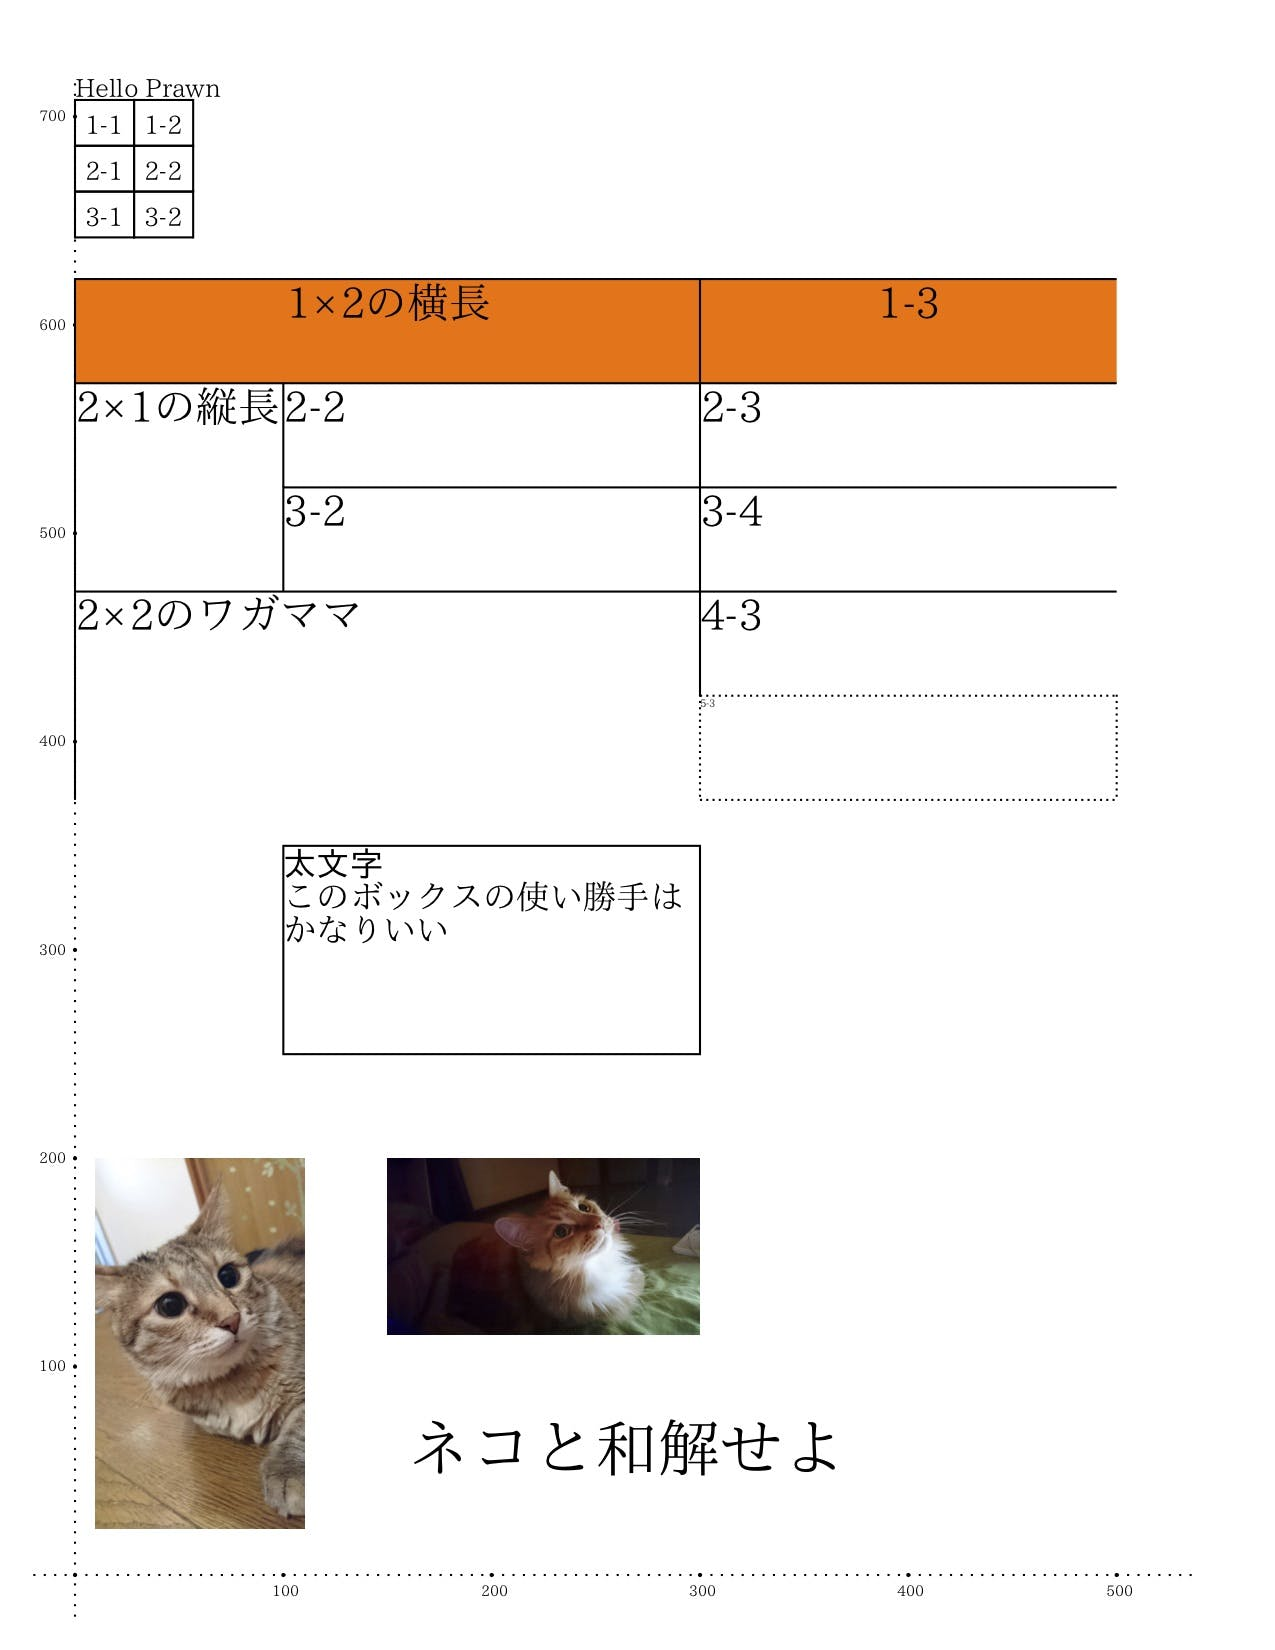 test (11).jpg